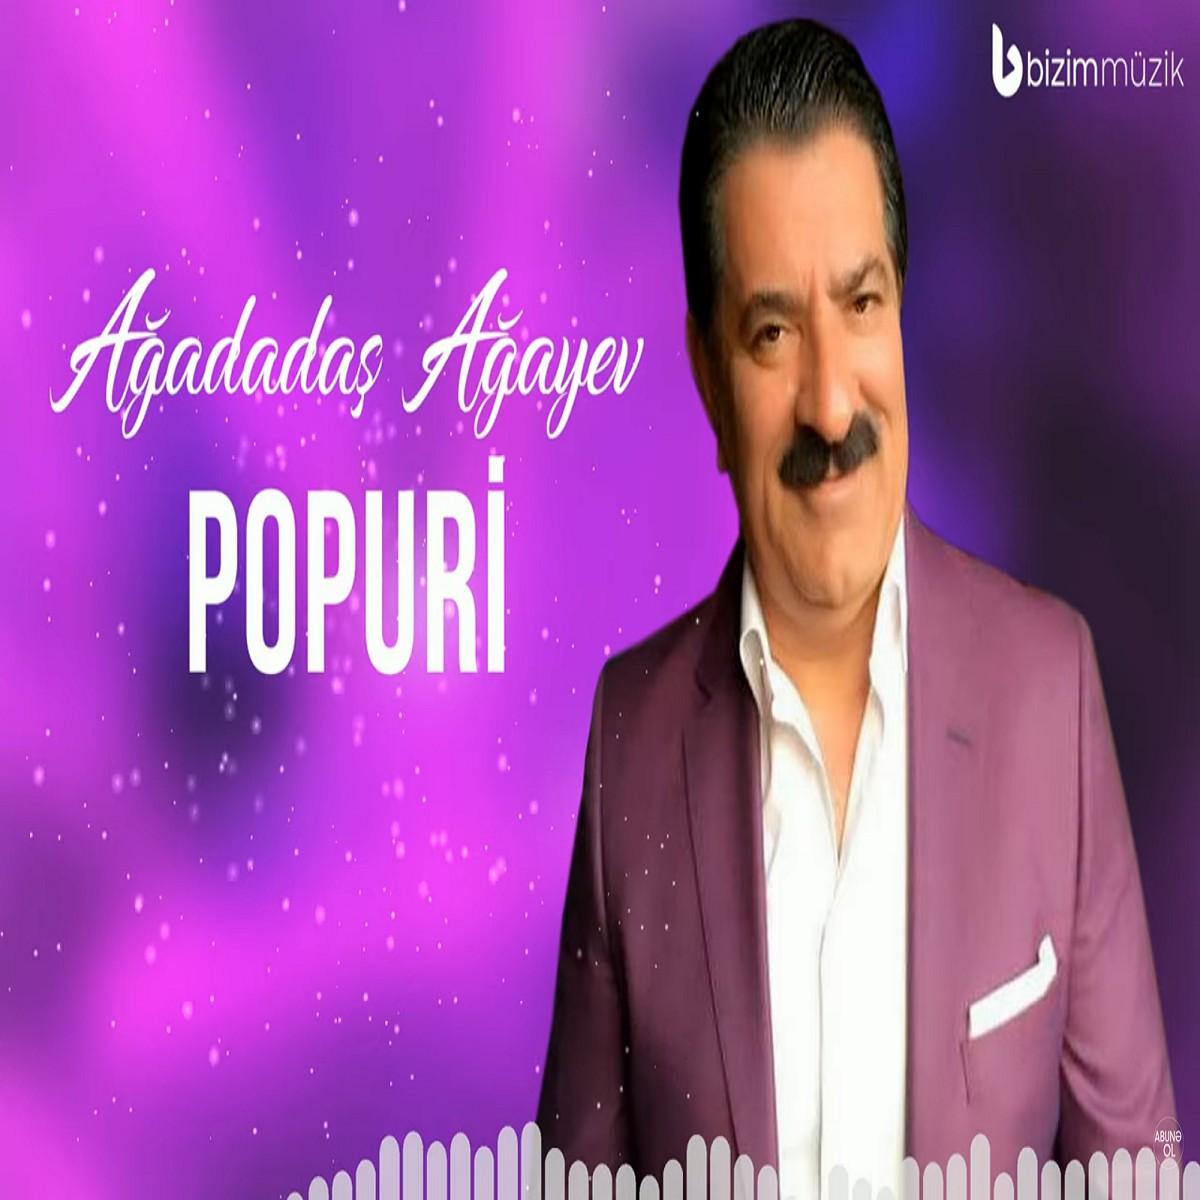 http://s6.picofile.com/file/8387875592/03Agadadas_Agayev_Popuri.jpg